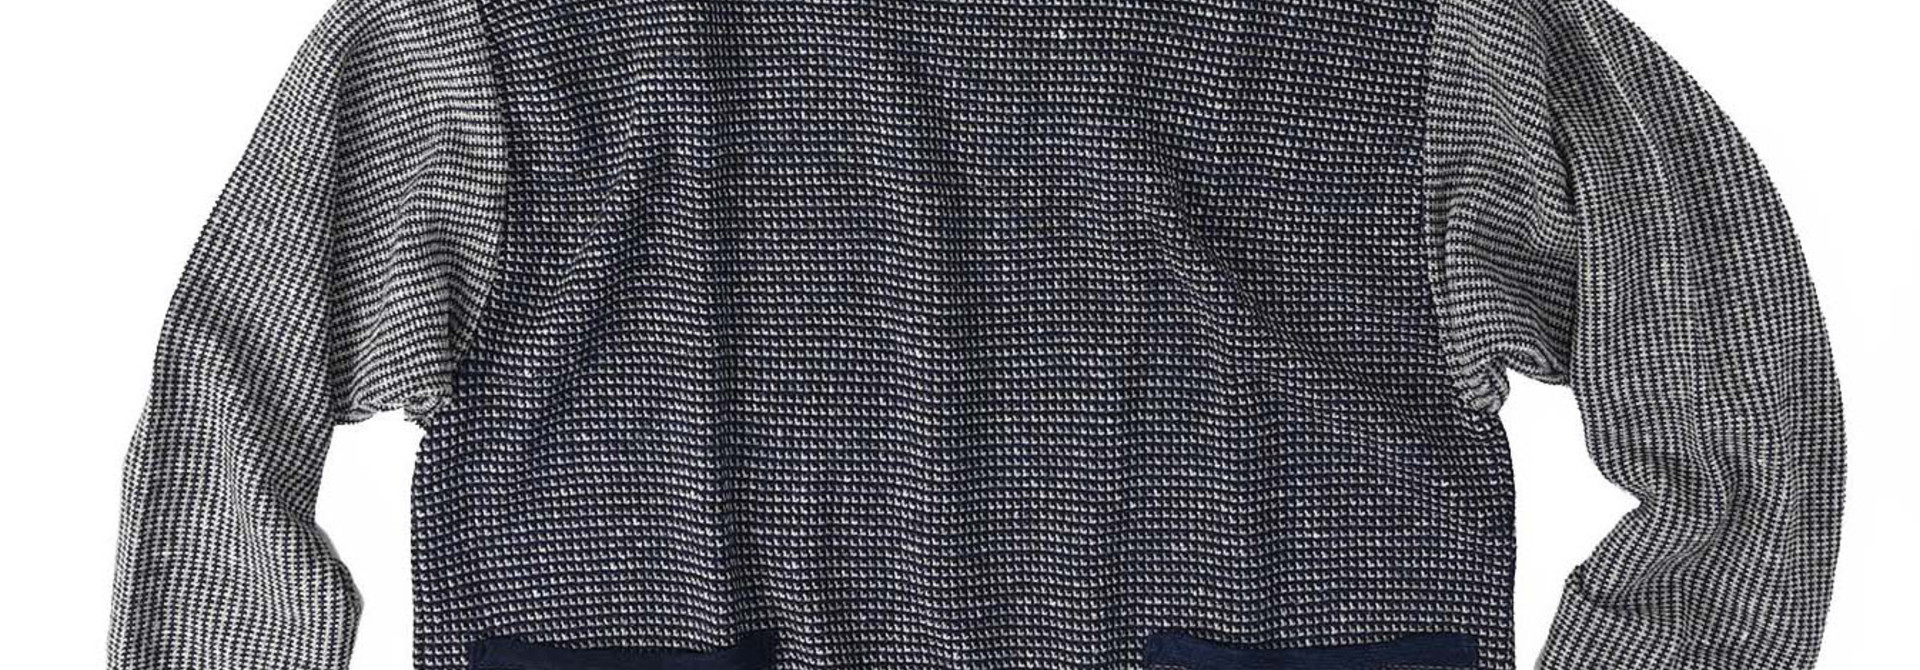 Indigo Tappet Kanoko Umahiko Sweater